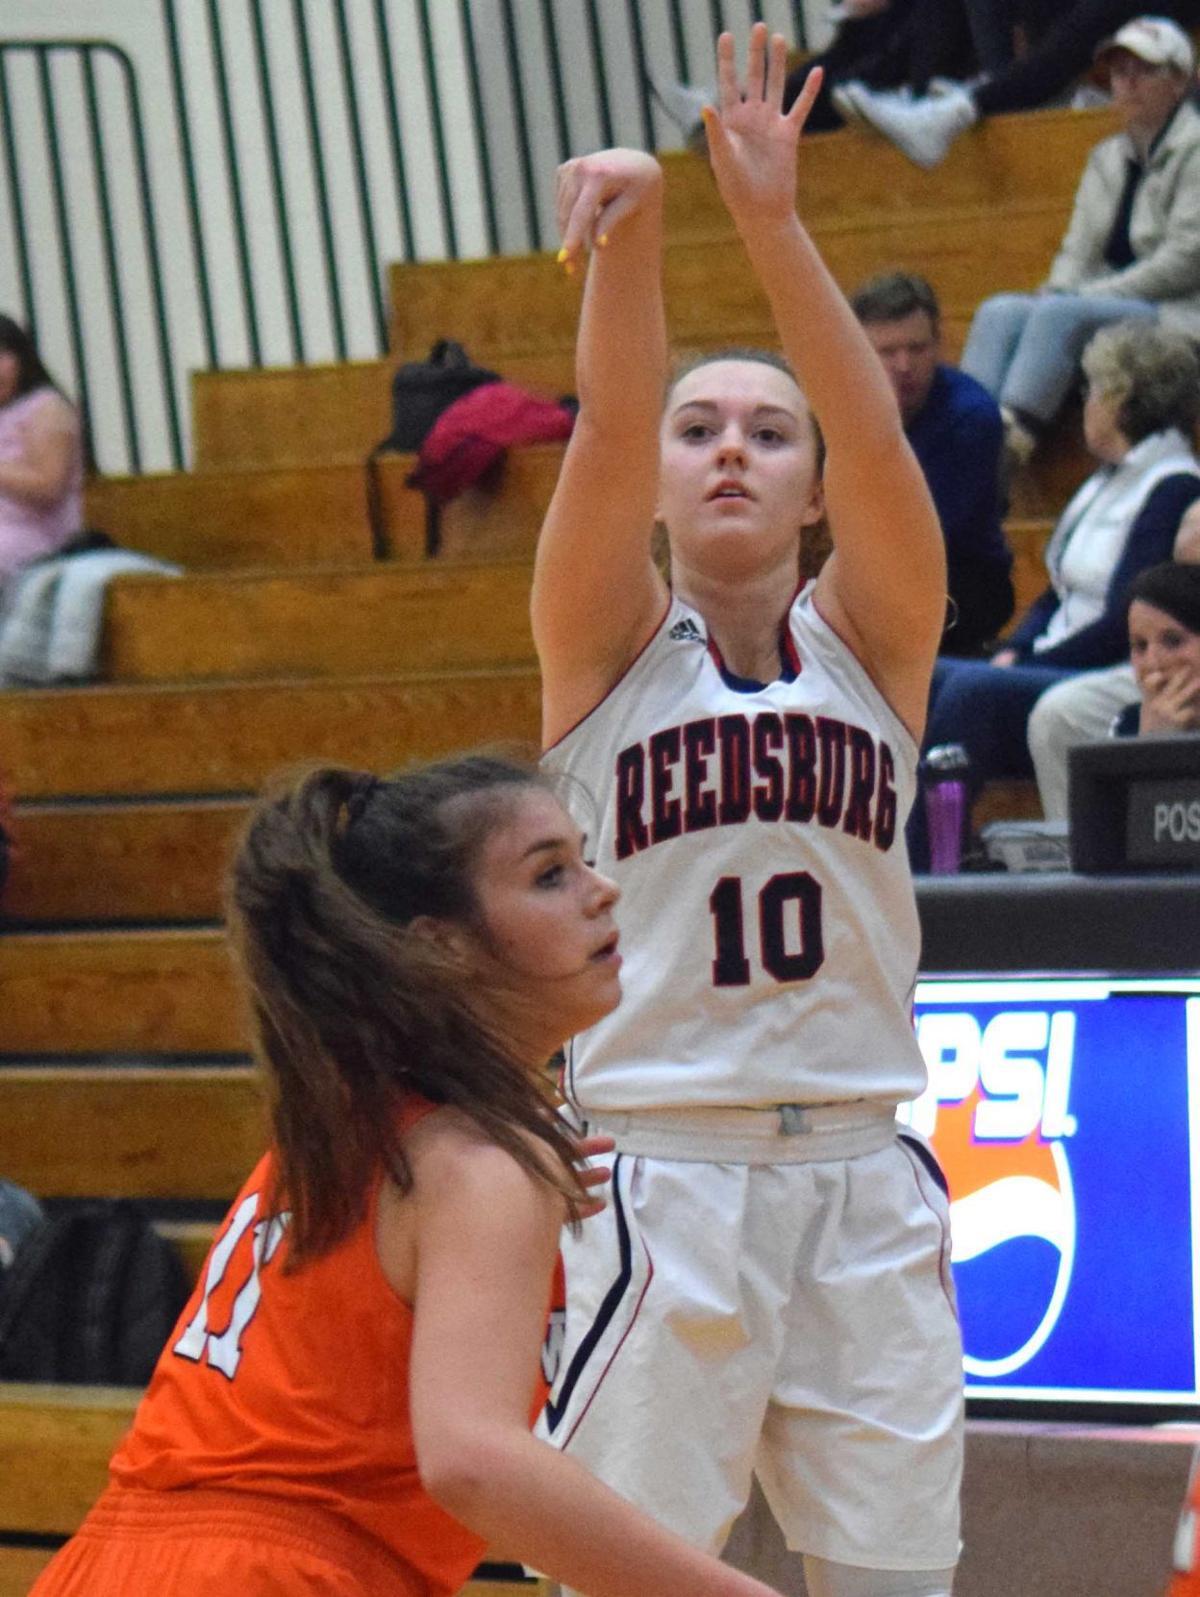 Prep girls basketball photo: Reedsburg's Julia Korklewski